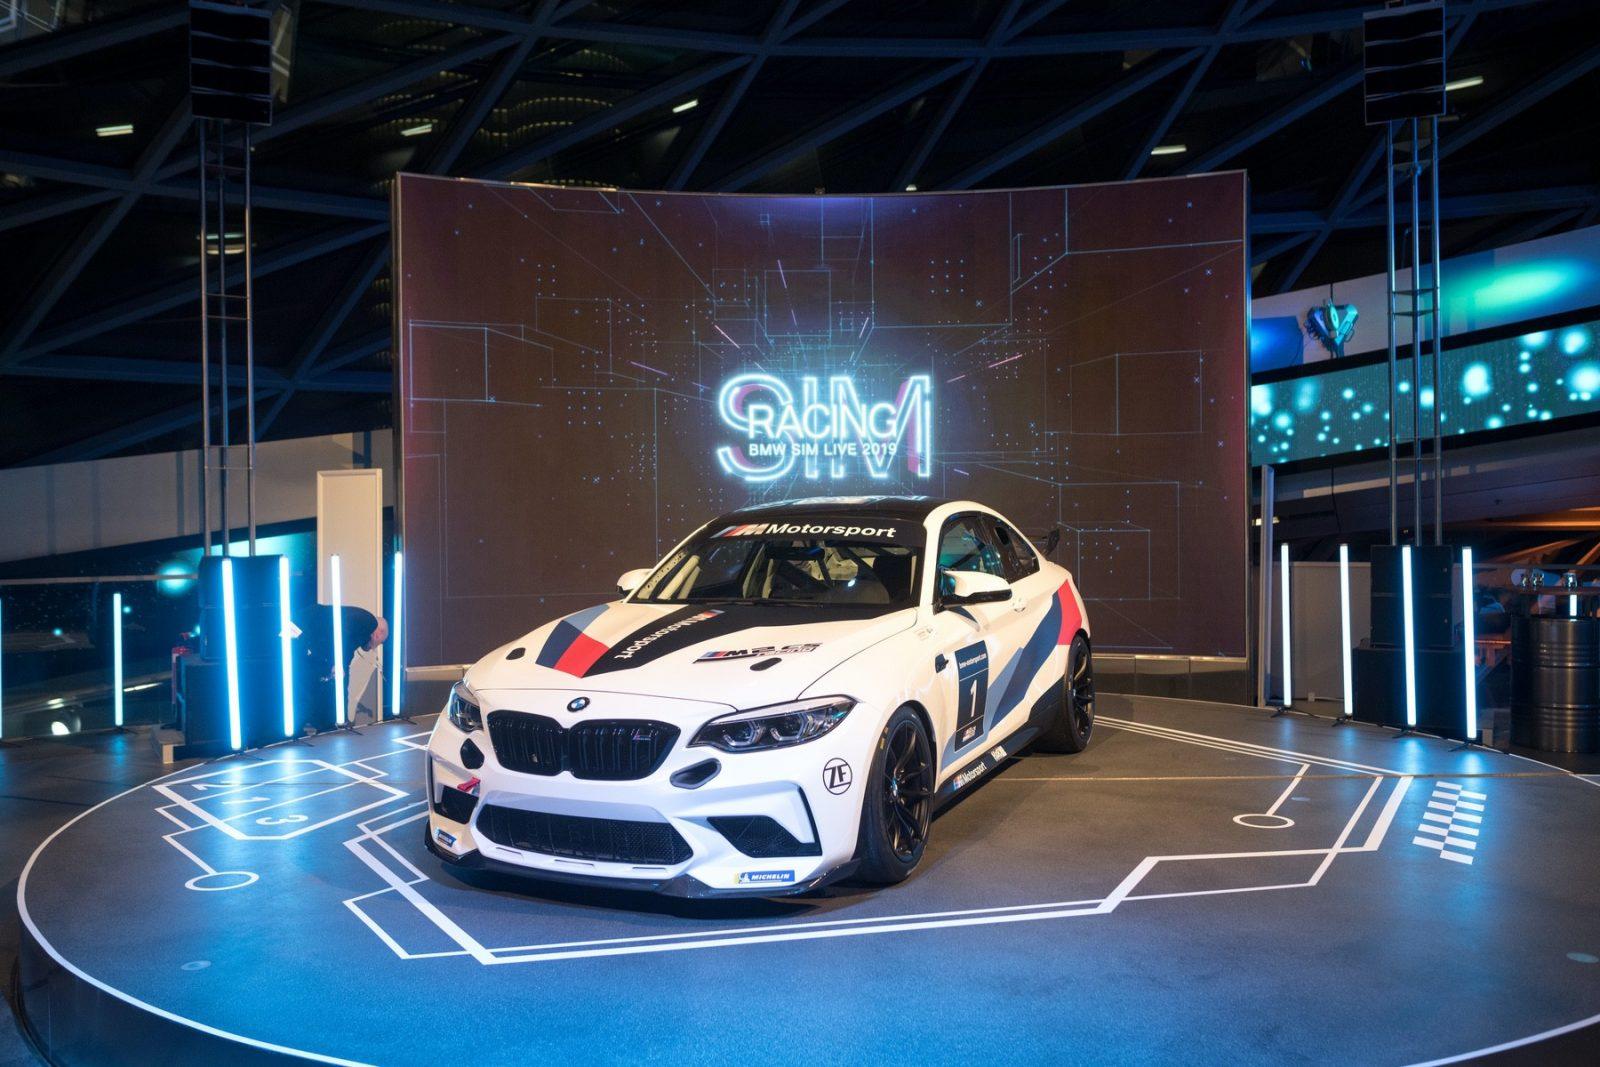 BMW M2 CS race car